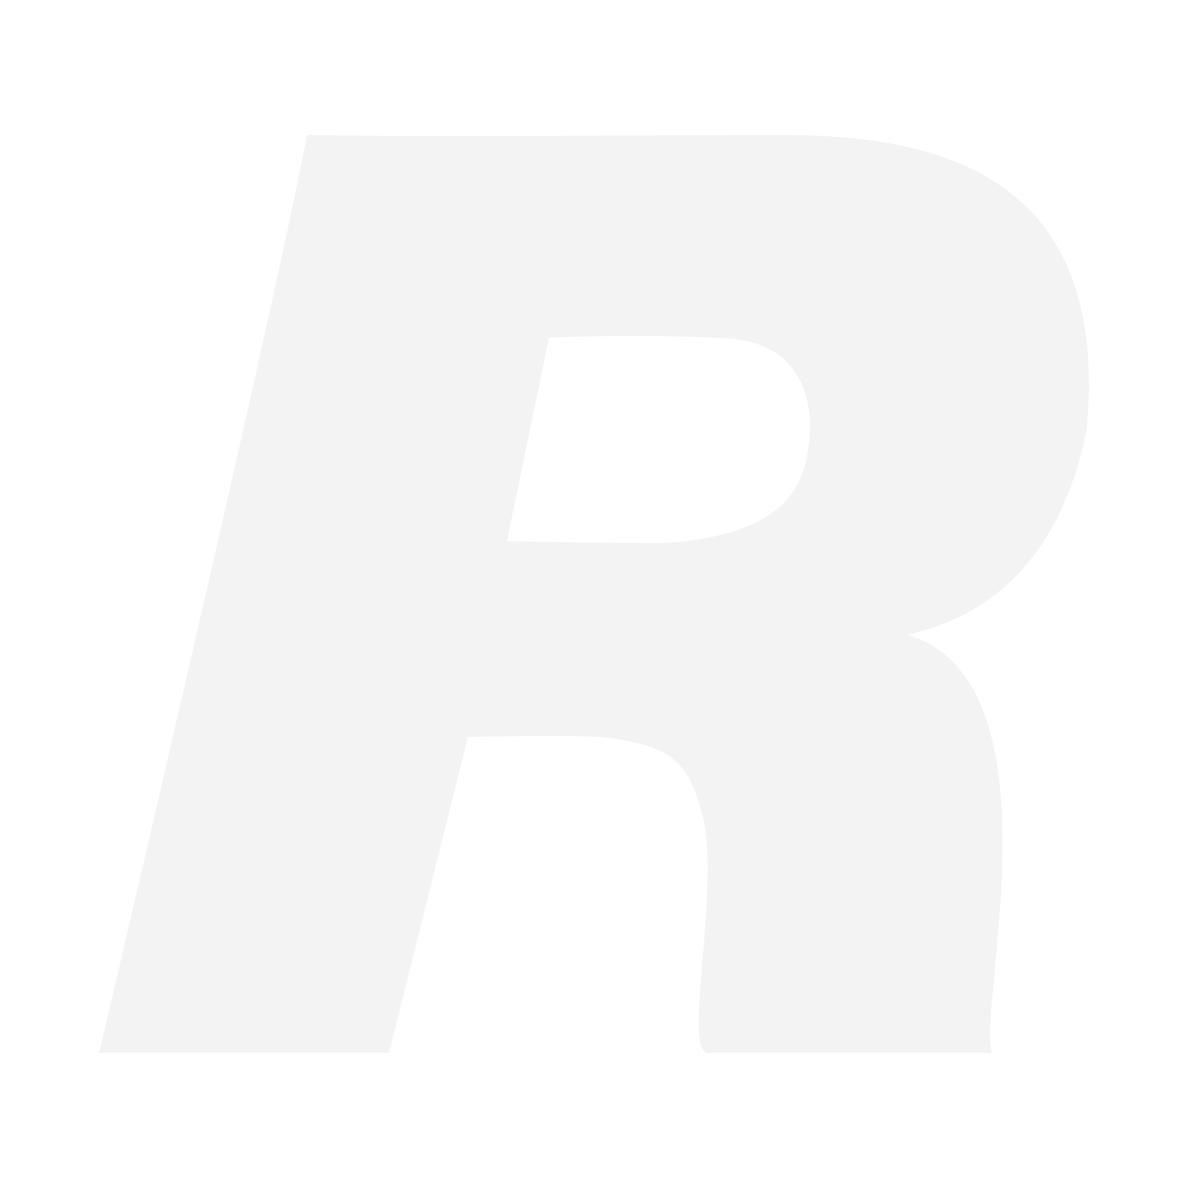 Elinchrom E208472 D-Lite RX One/One